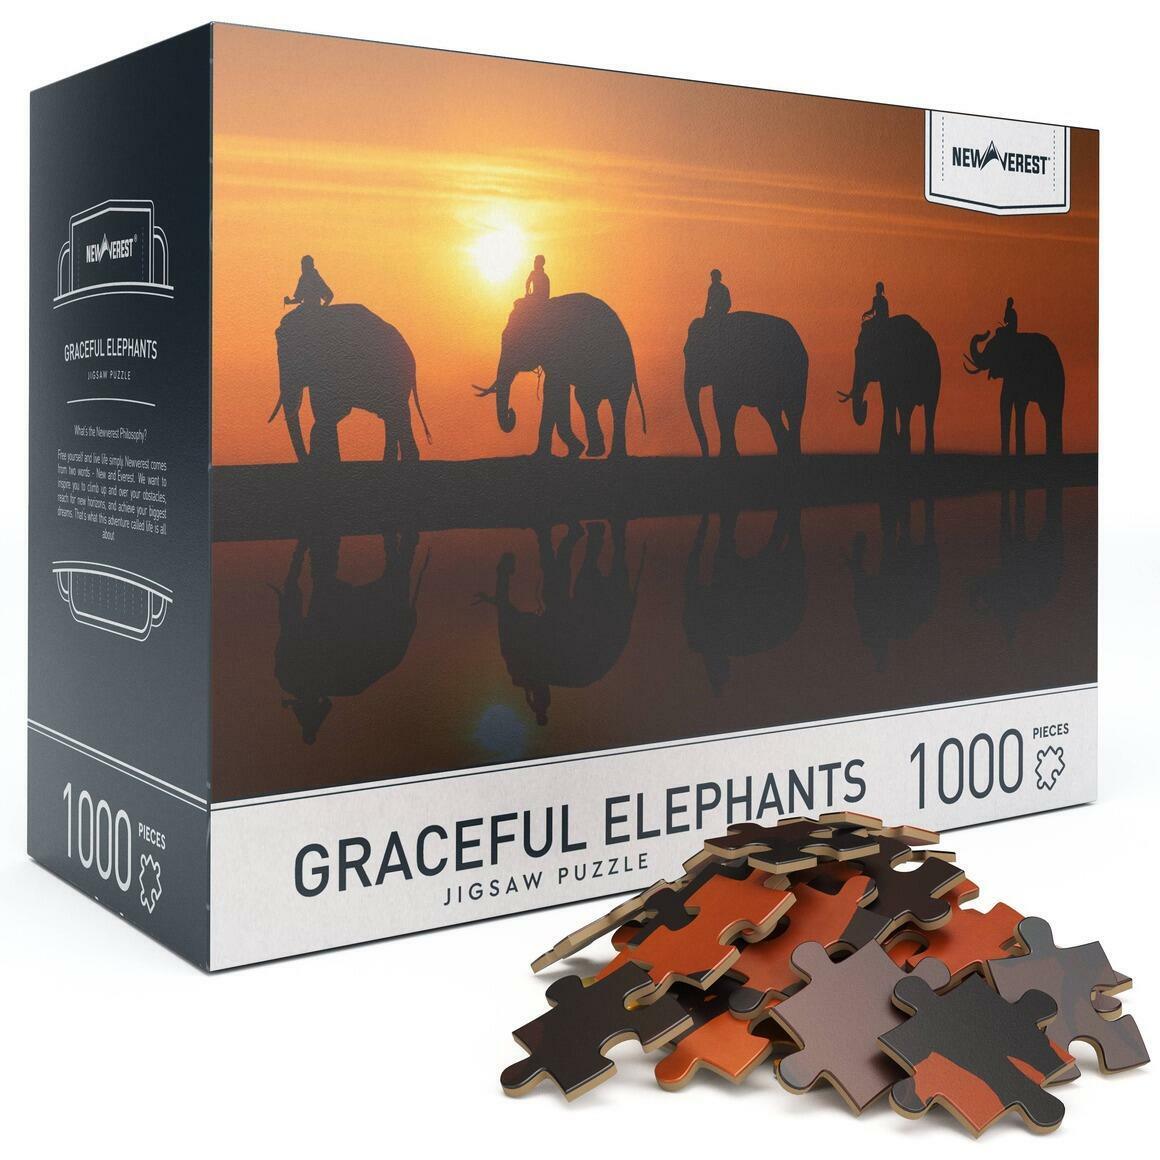 1000 pcs Newverest Graceful Elephants Jigsaw Puzzle | Trada Marketplace